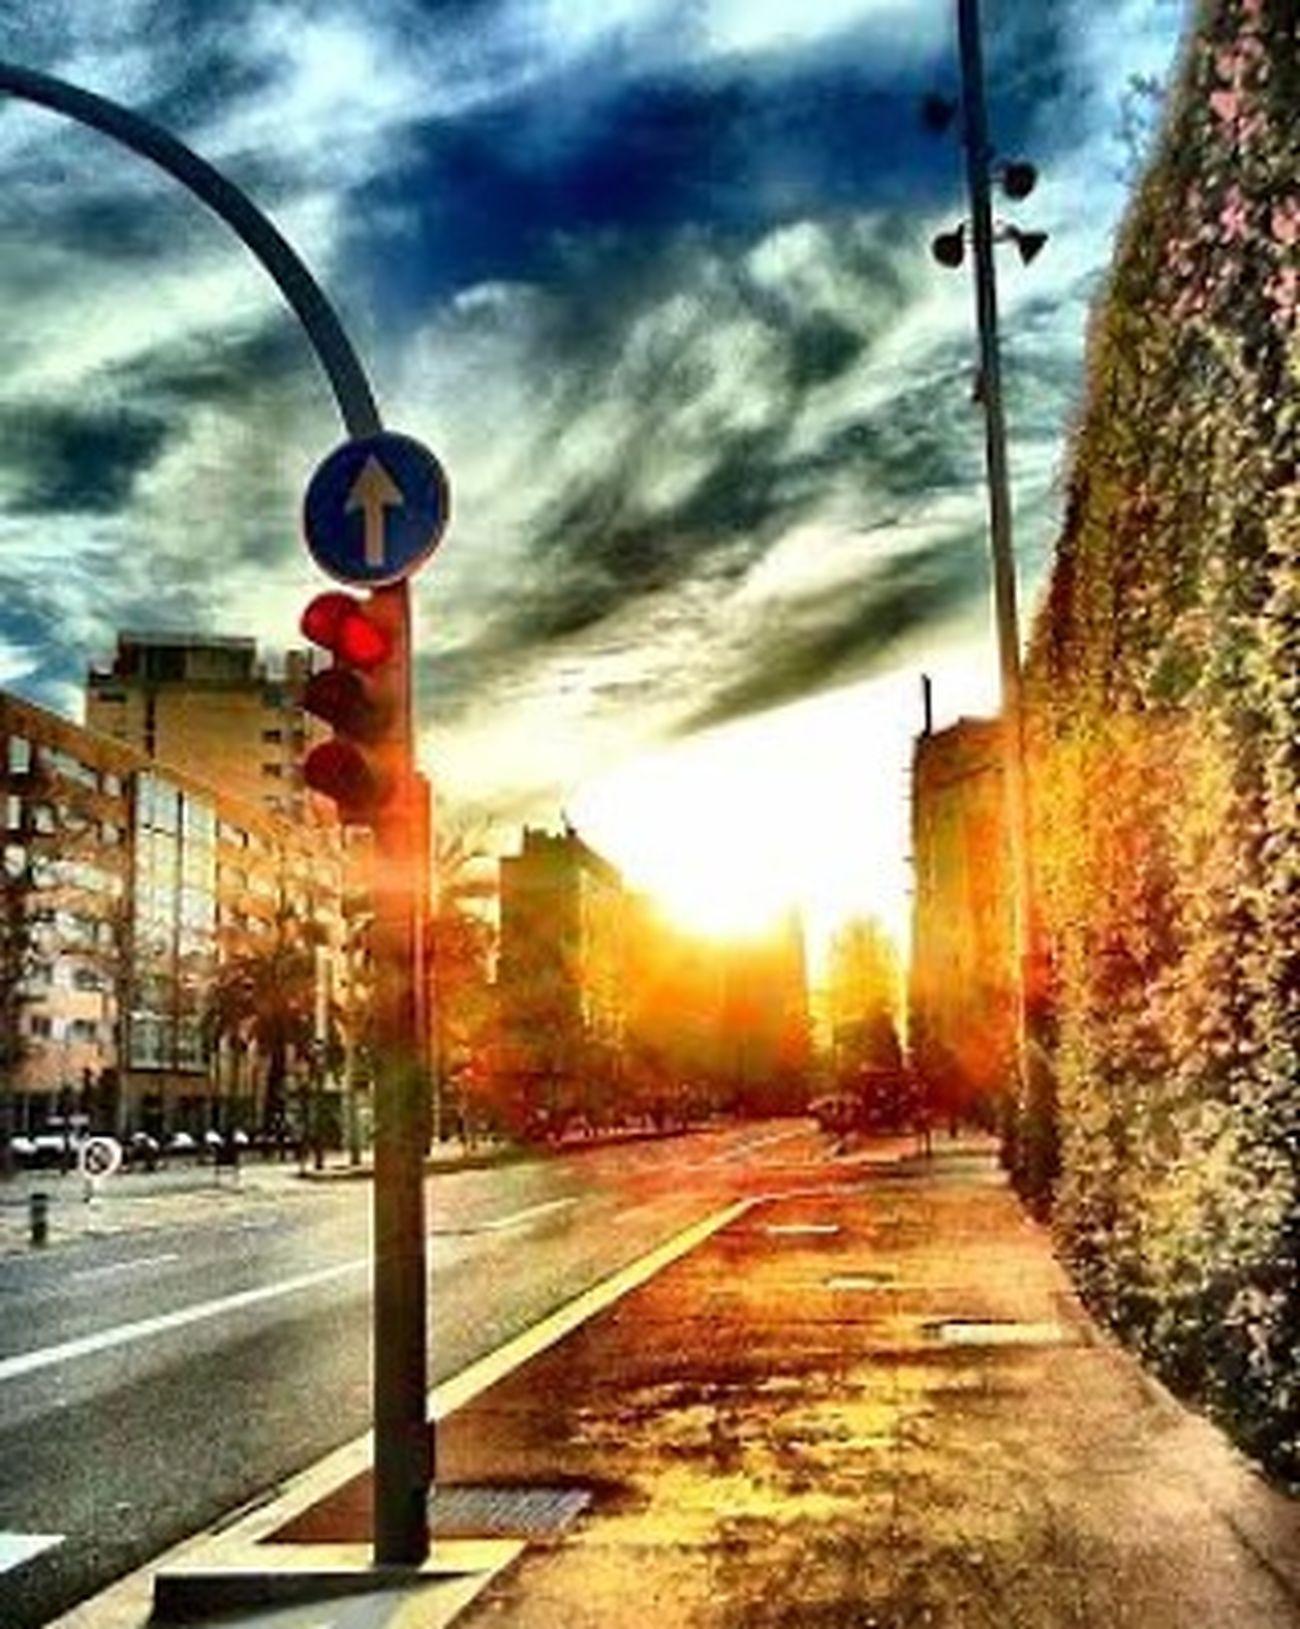 Street Katu Calle Rue Barcelona Bcnexplorers Bcndreamers Thebarcelonist Urbanlandscape Igersbarcelona Ig_catalonia HDR Hdr_spain Tv_hdr Sunsunsun_hereitcomes